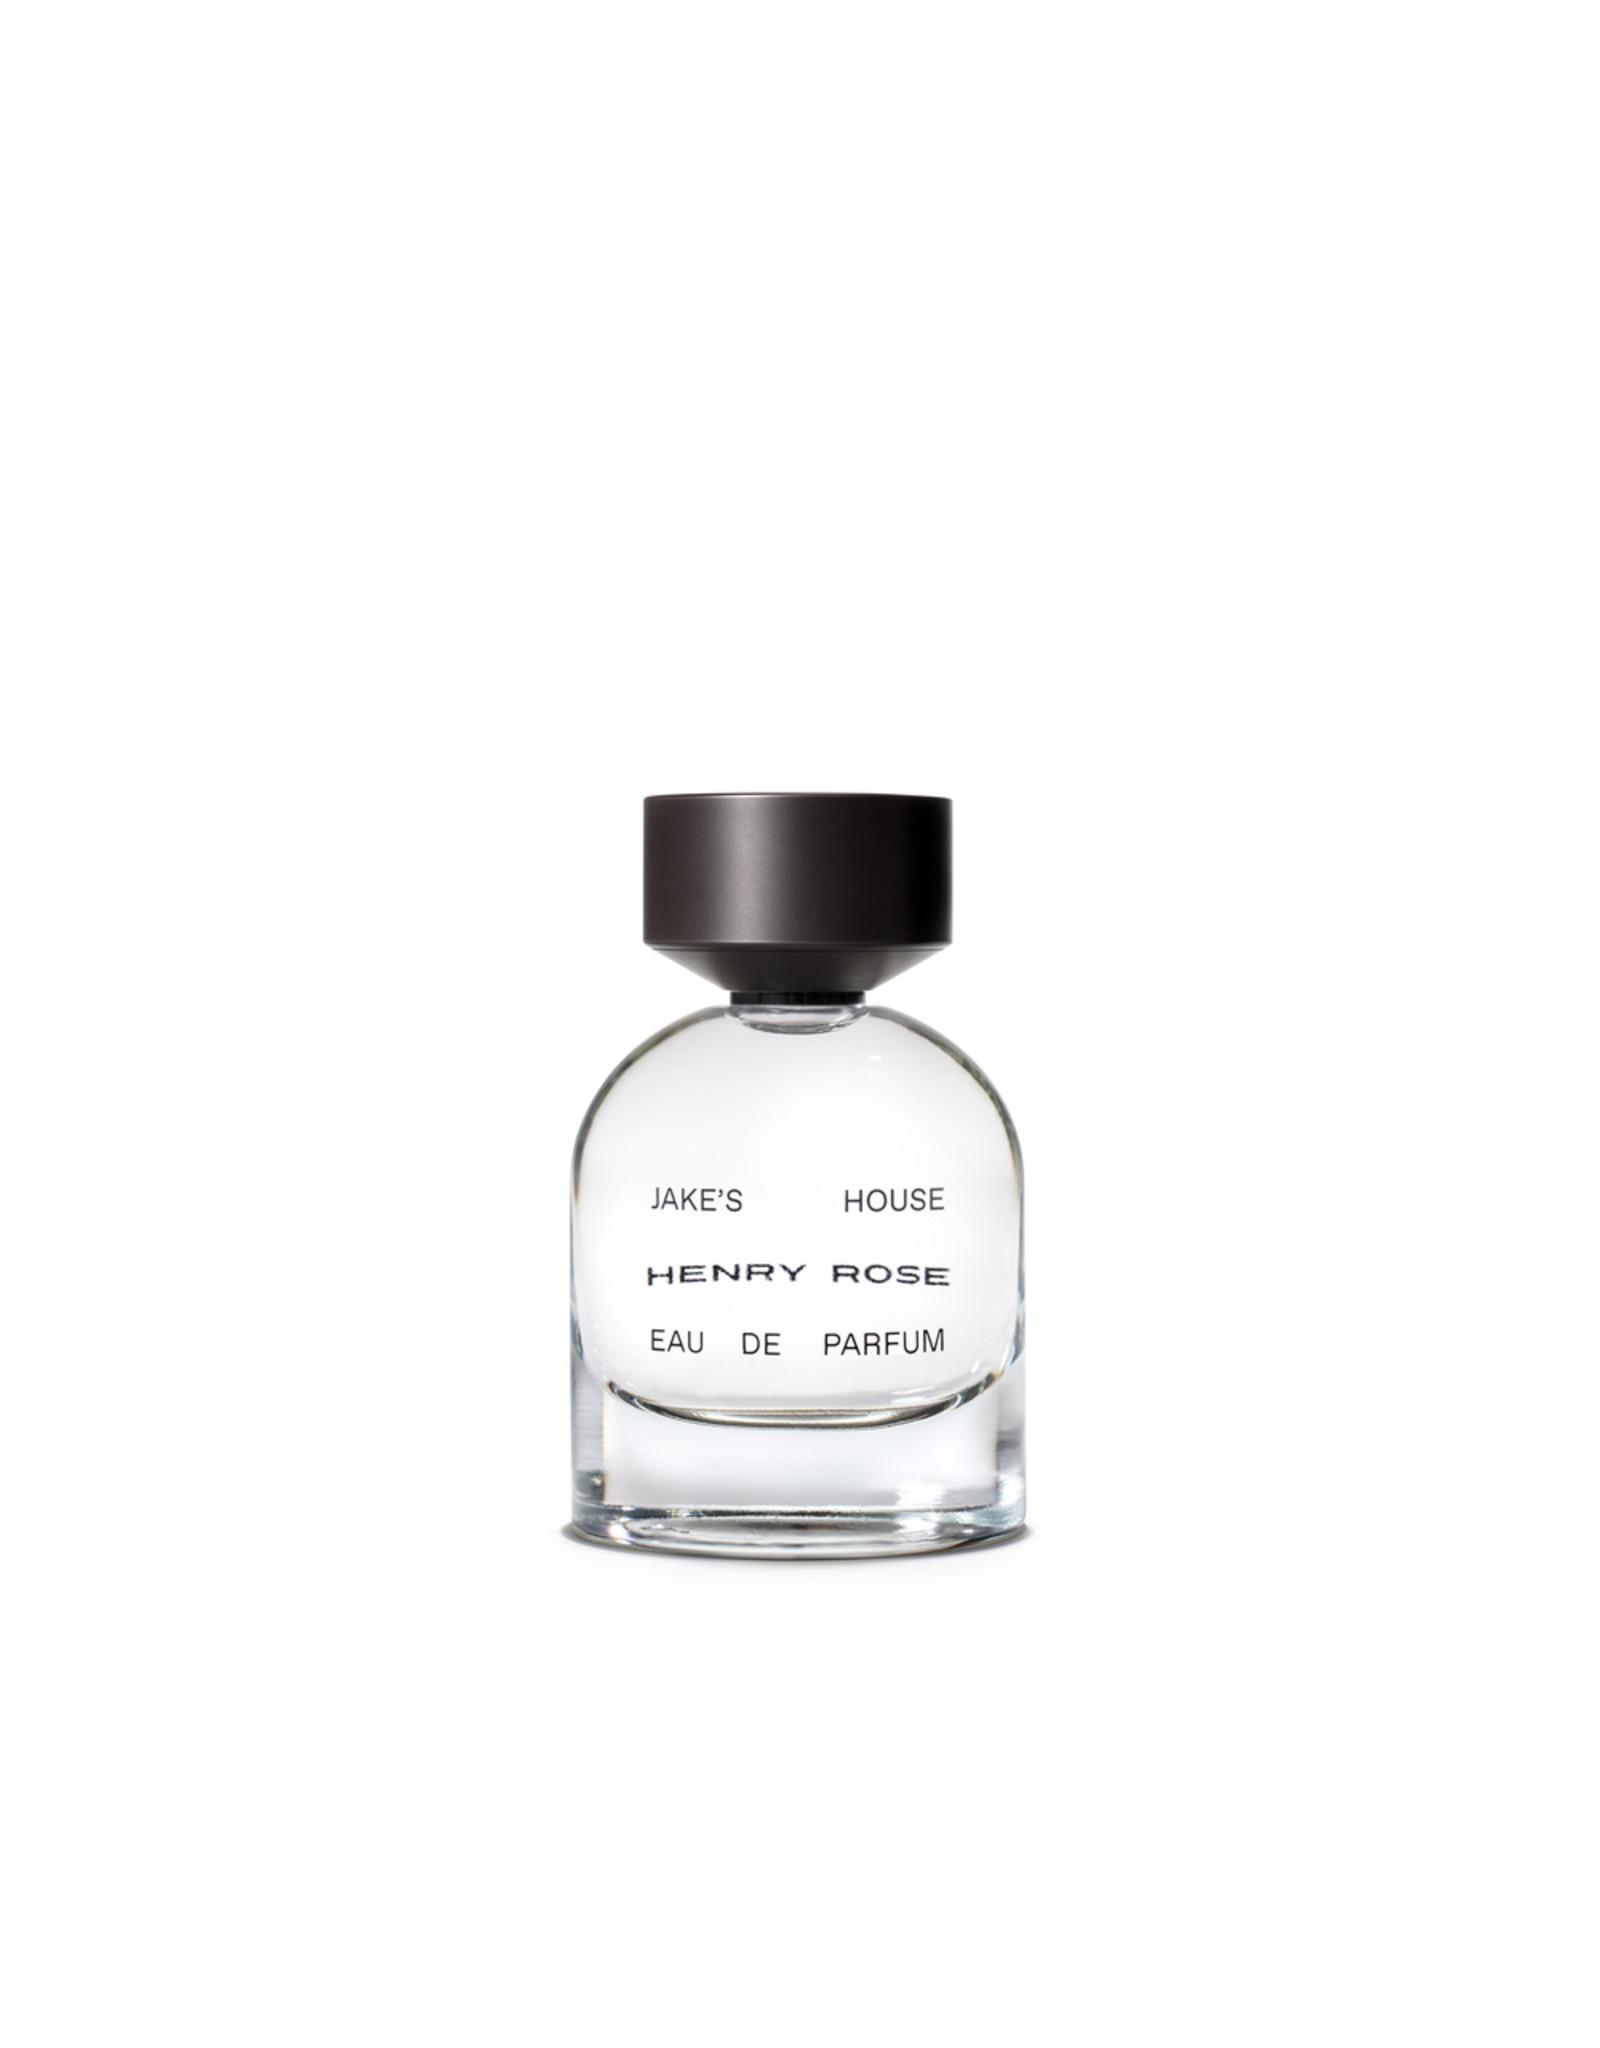 Henry Rose Henry Rose Eau De Parfum- Jake's House (Size: 50ml)